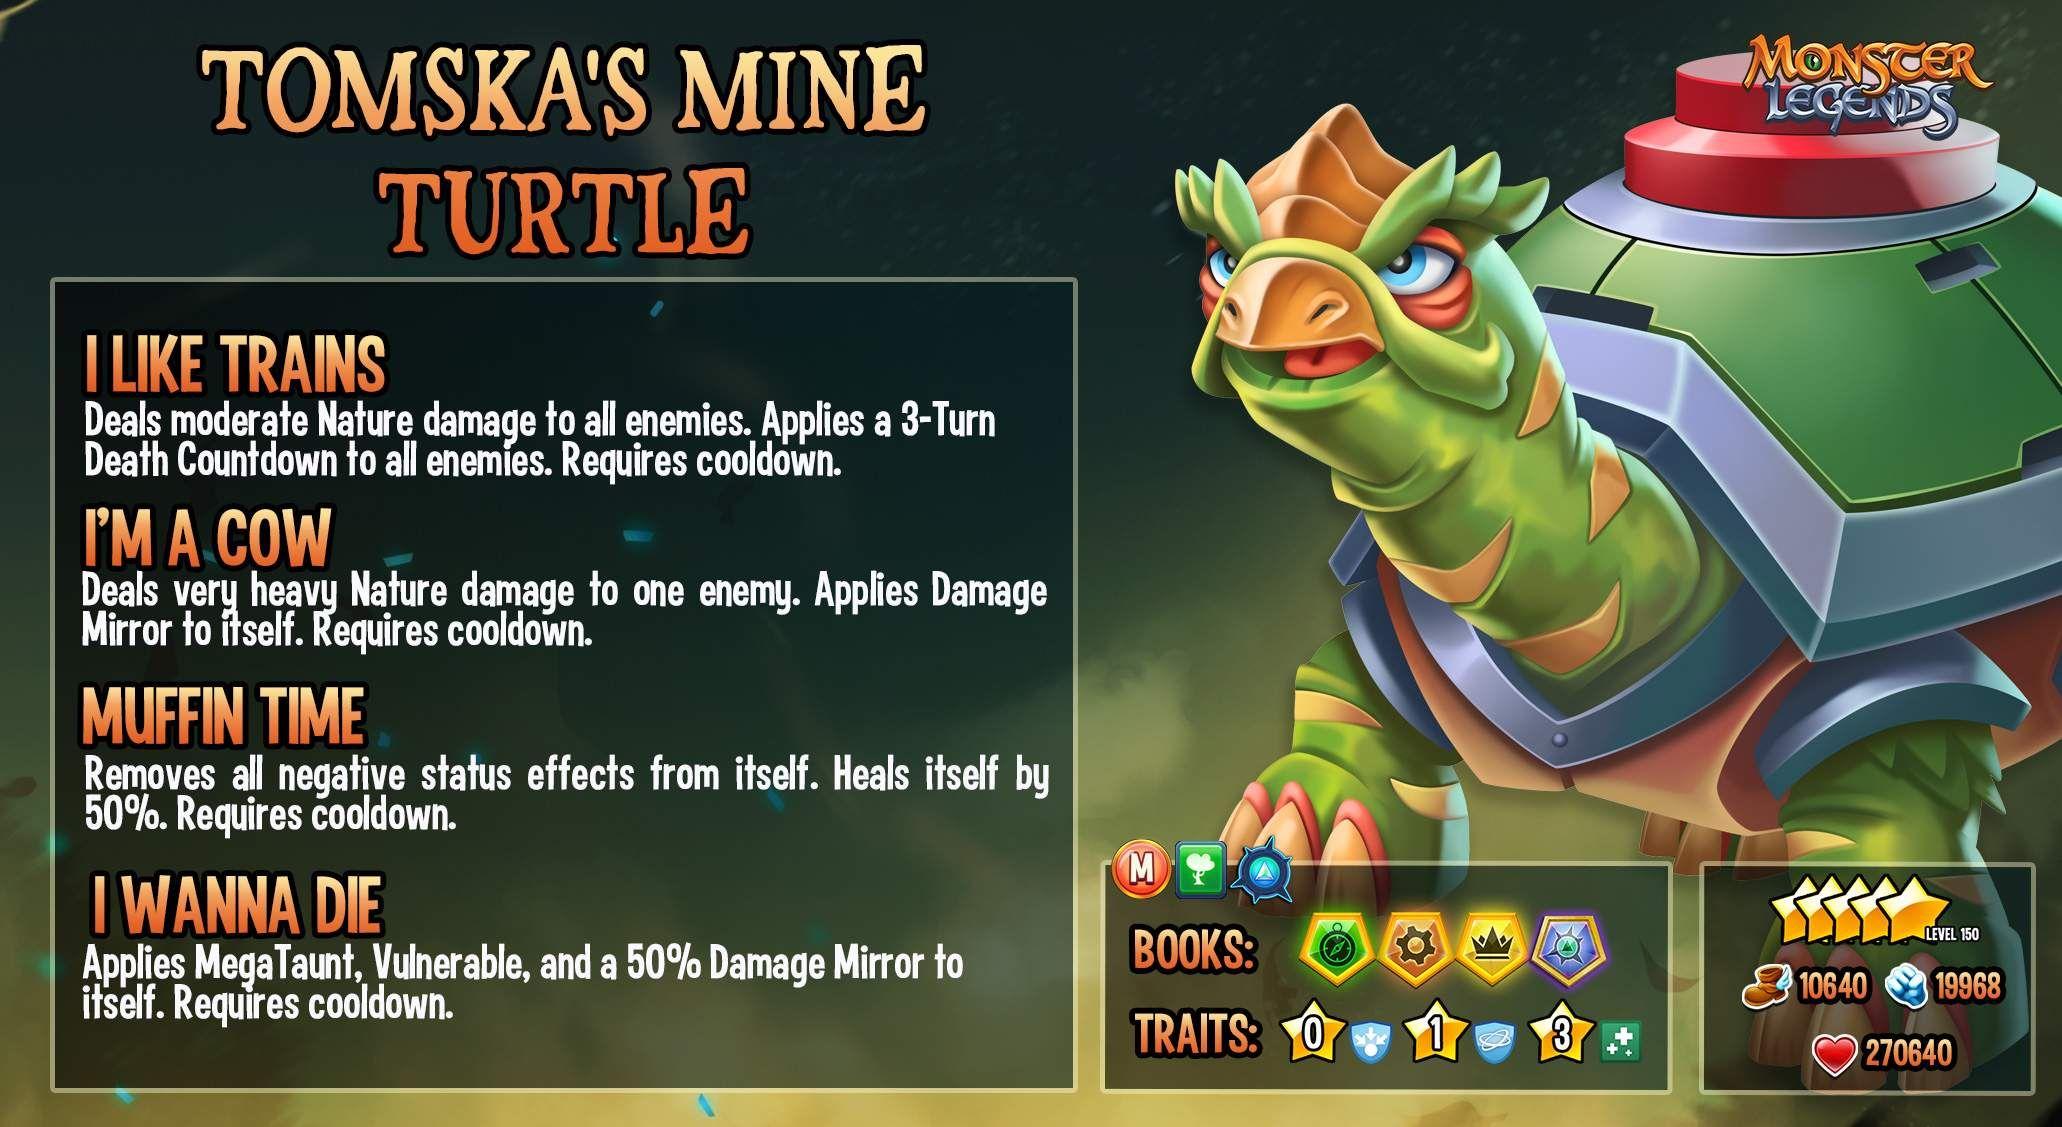 0_1624376099870_TomSka's-Mine-Turtle.jpg